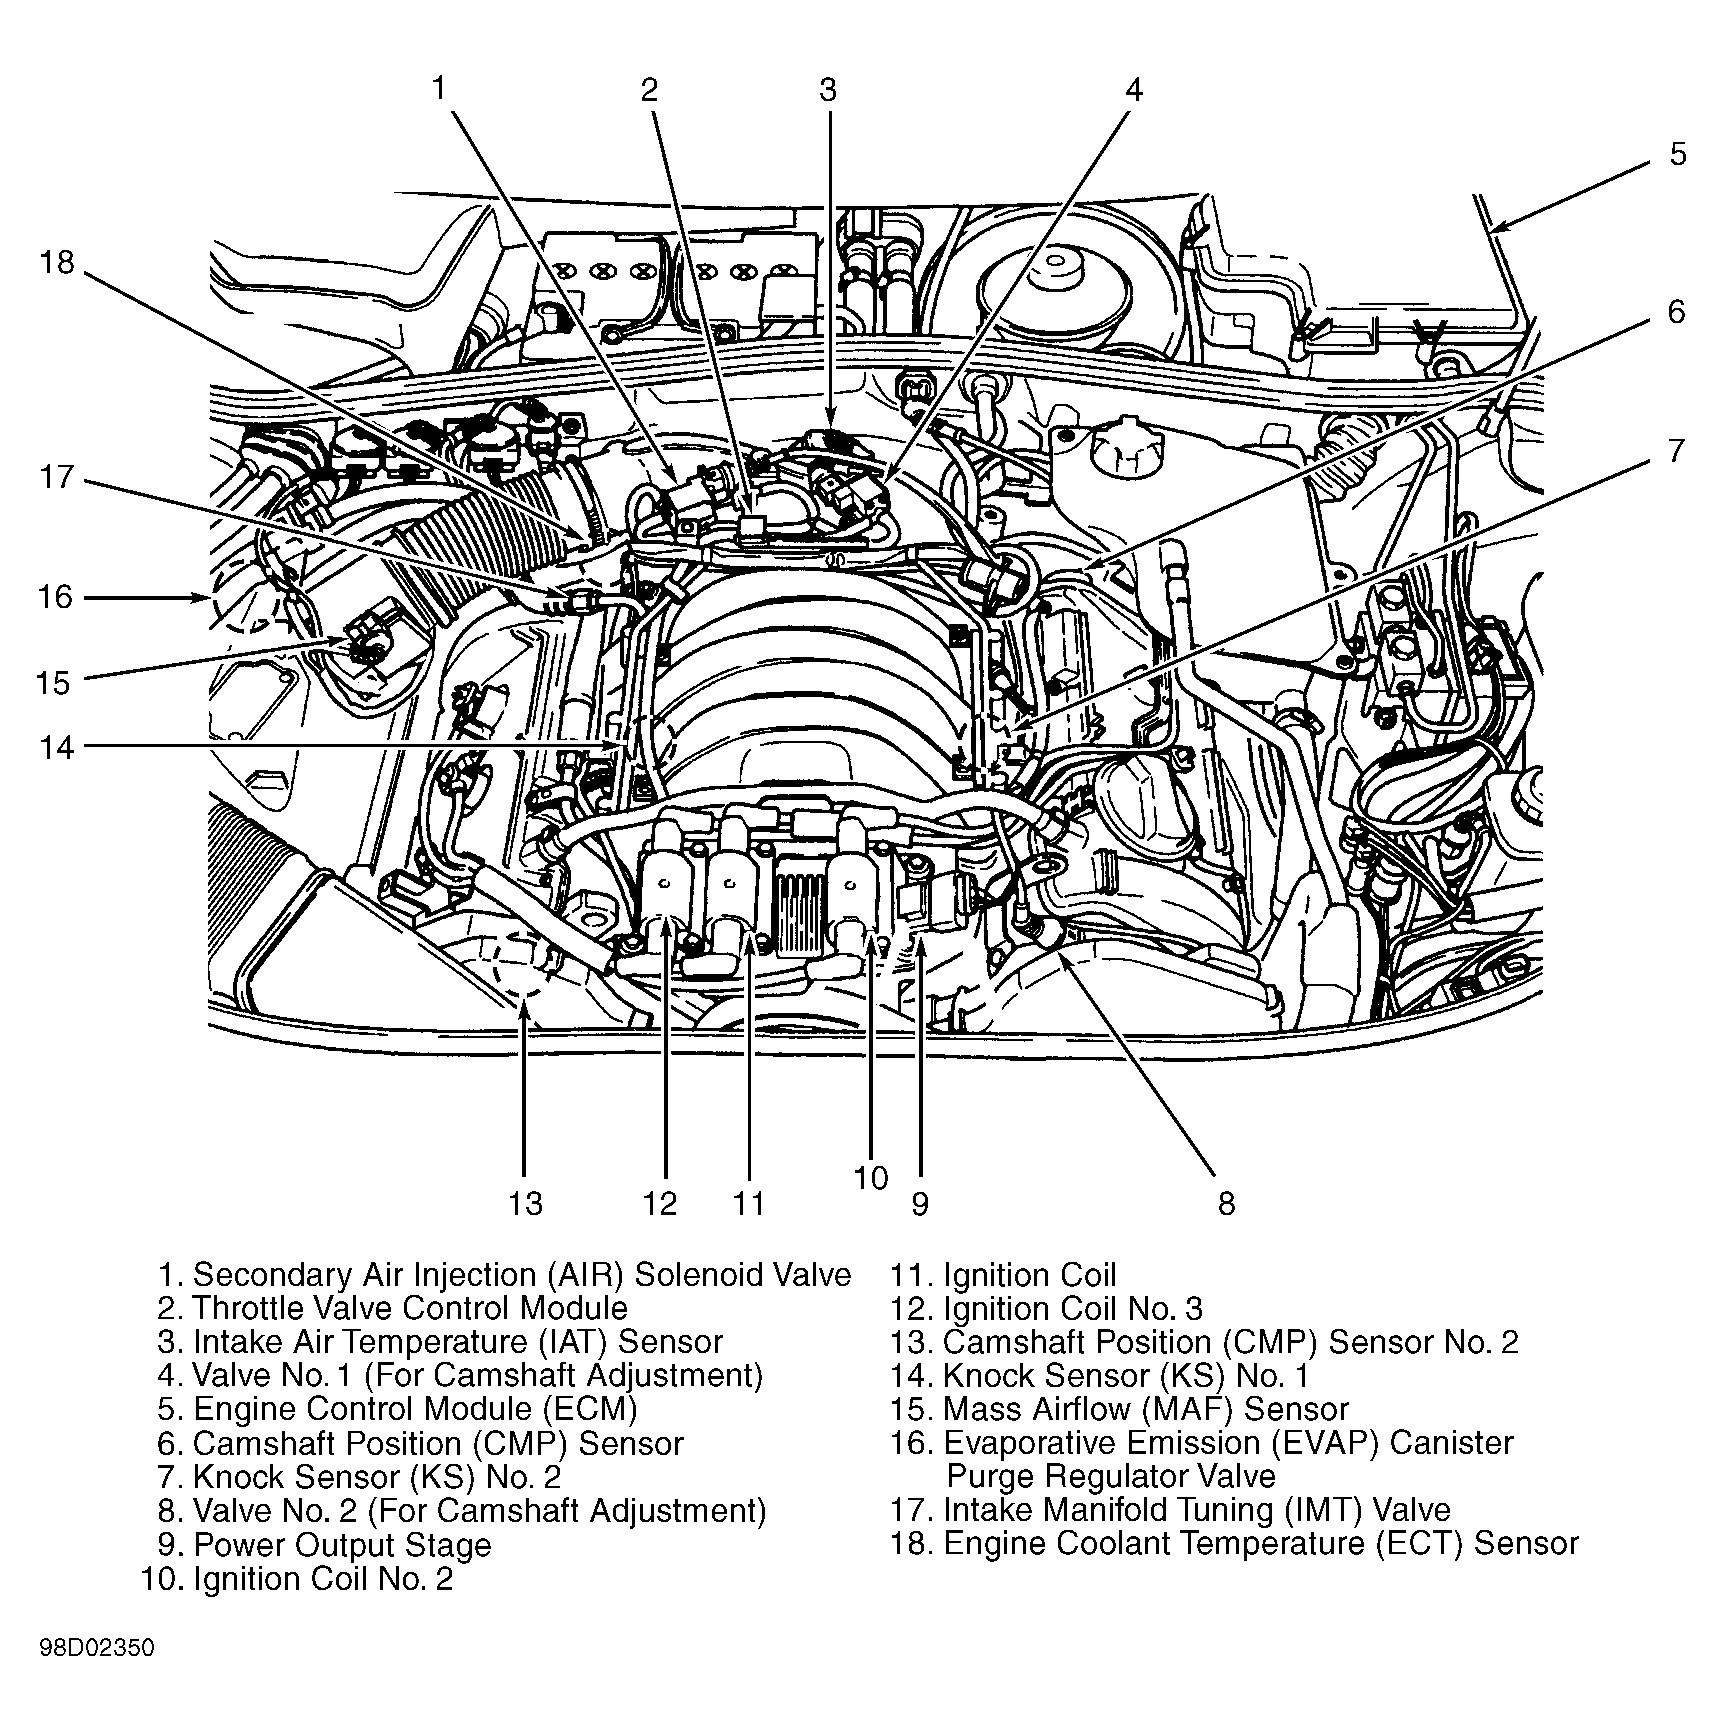 2001 Vw Passat 1 8 T Engine Diagram 2 7t Engine Diagram